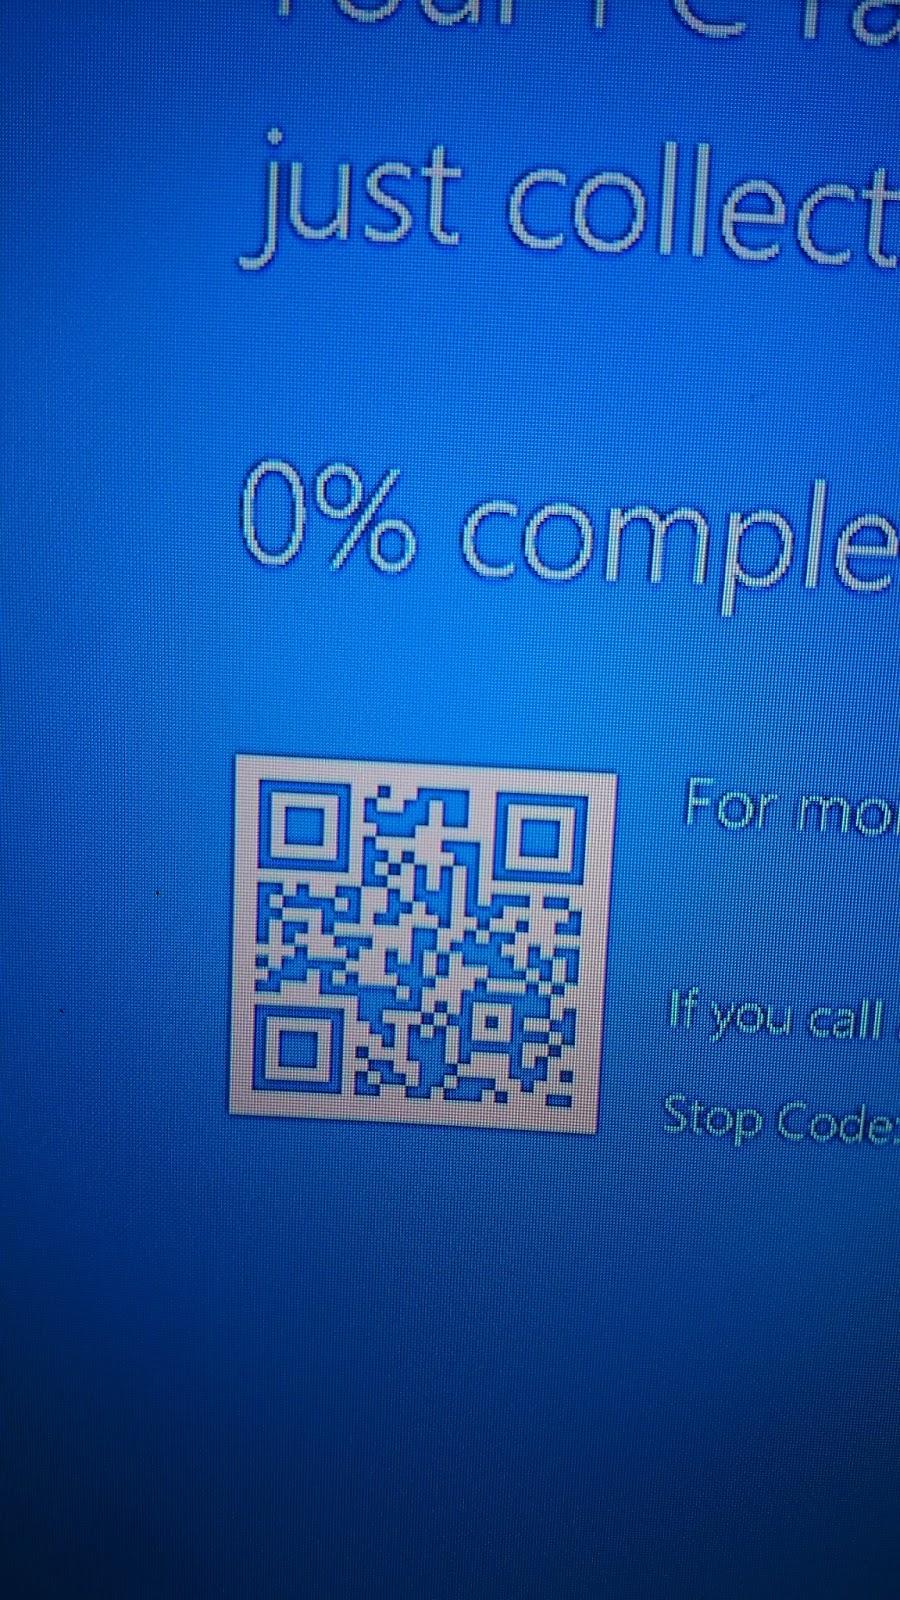 Windows 10 BSODs gets a facelift :) | Kunmi's Space